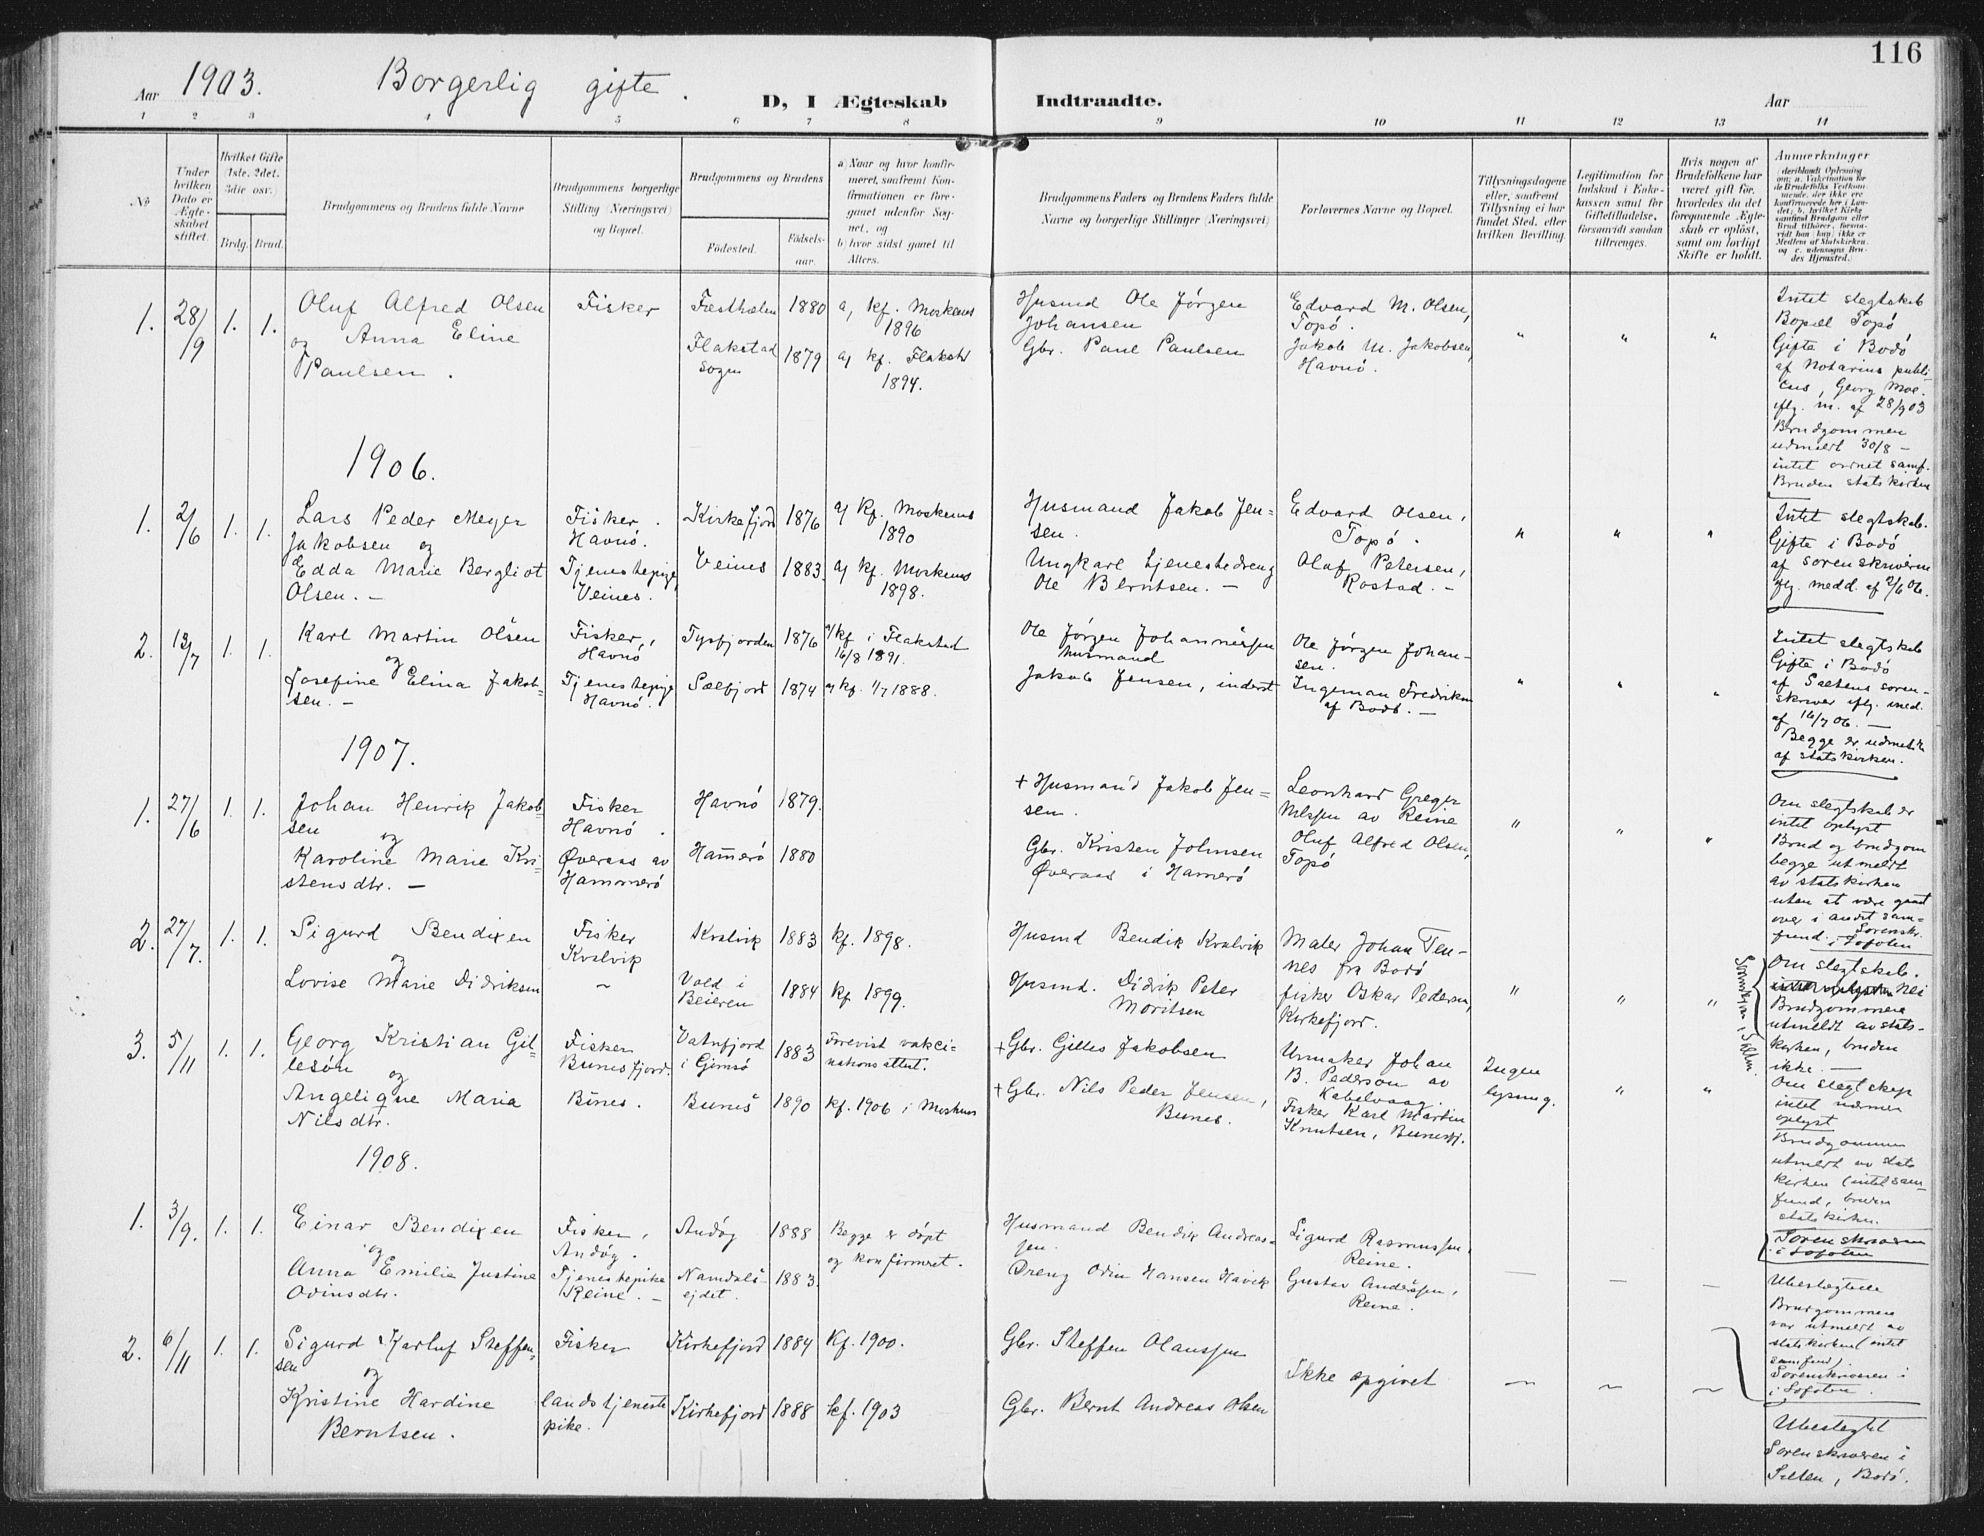 SAT, Ministerialprotokoller, klokkerbøker og fødselsregistre - Nordland, 886/L1221: Ministerialbok nr. 886A03, 1903-1913, s. 116